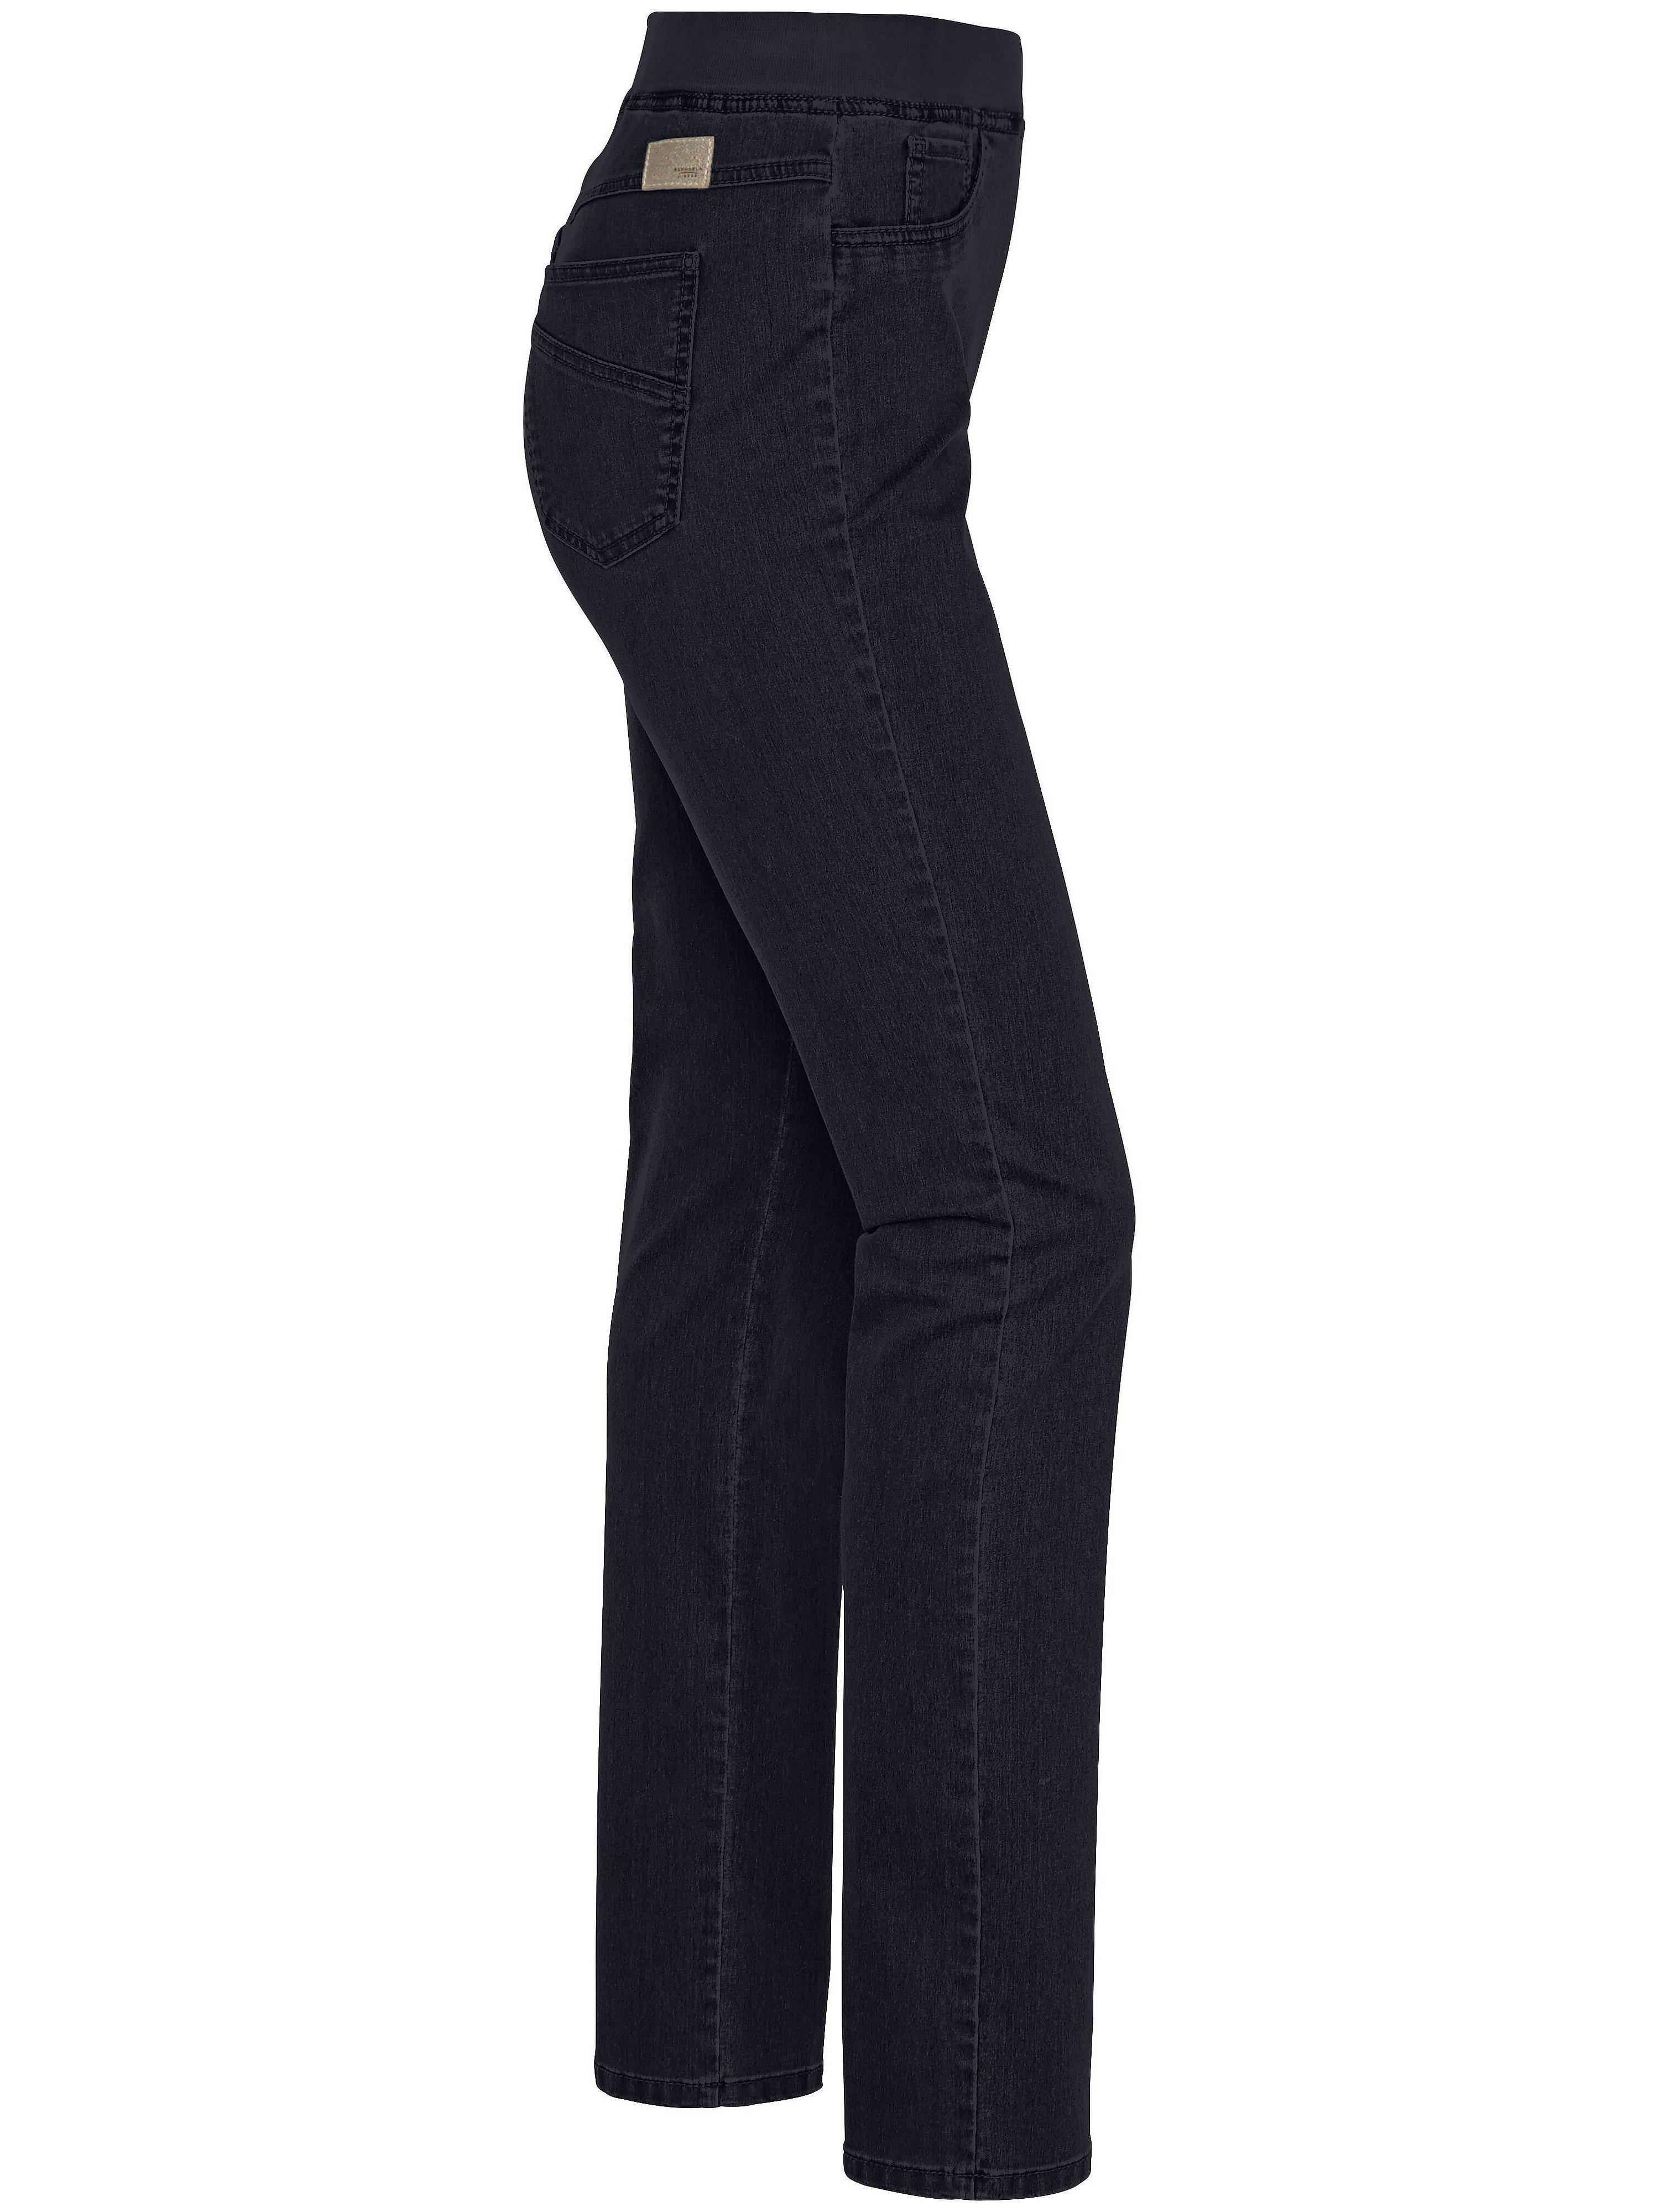 Comfort Plus-jeans model Carina Fra Raphaela by Brax sort